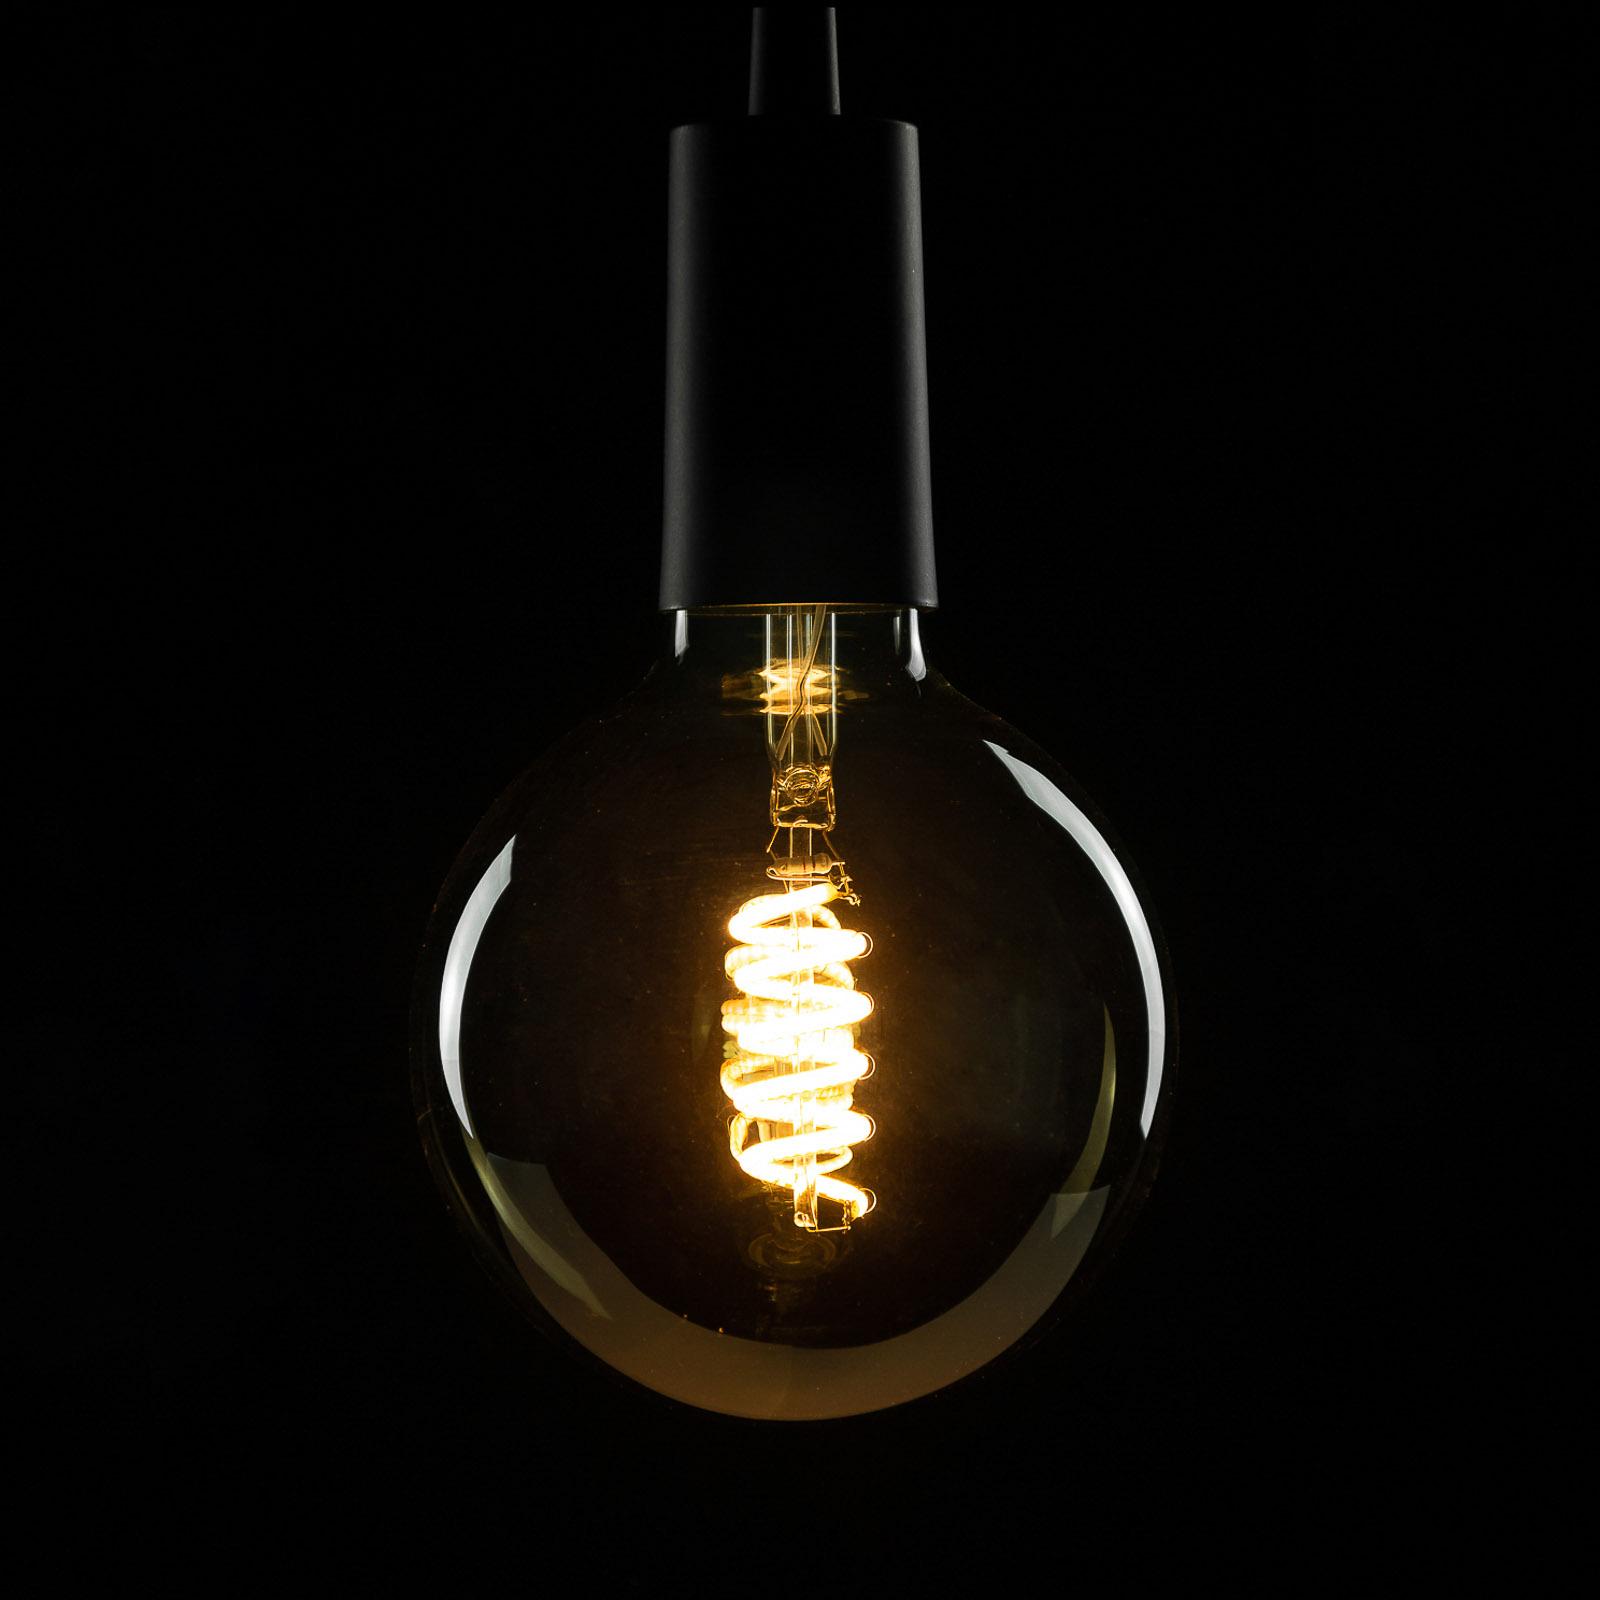 SEGULA LED E27 8 W G125 Curved ambient smoke